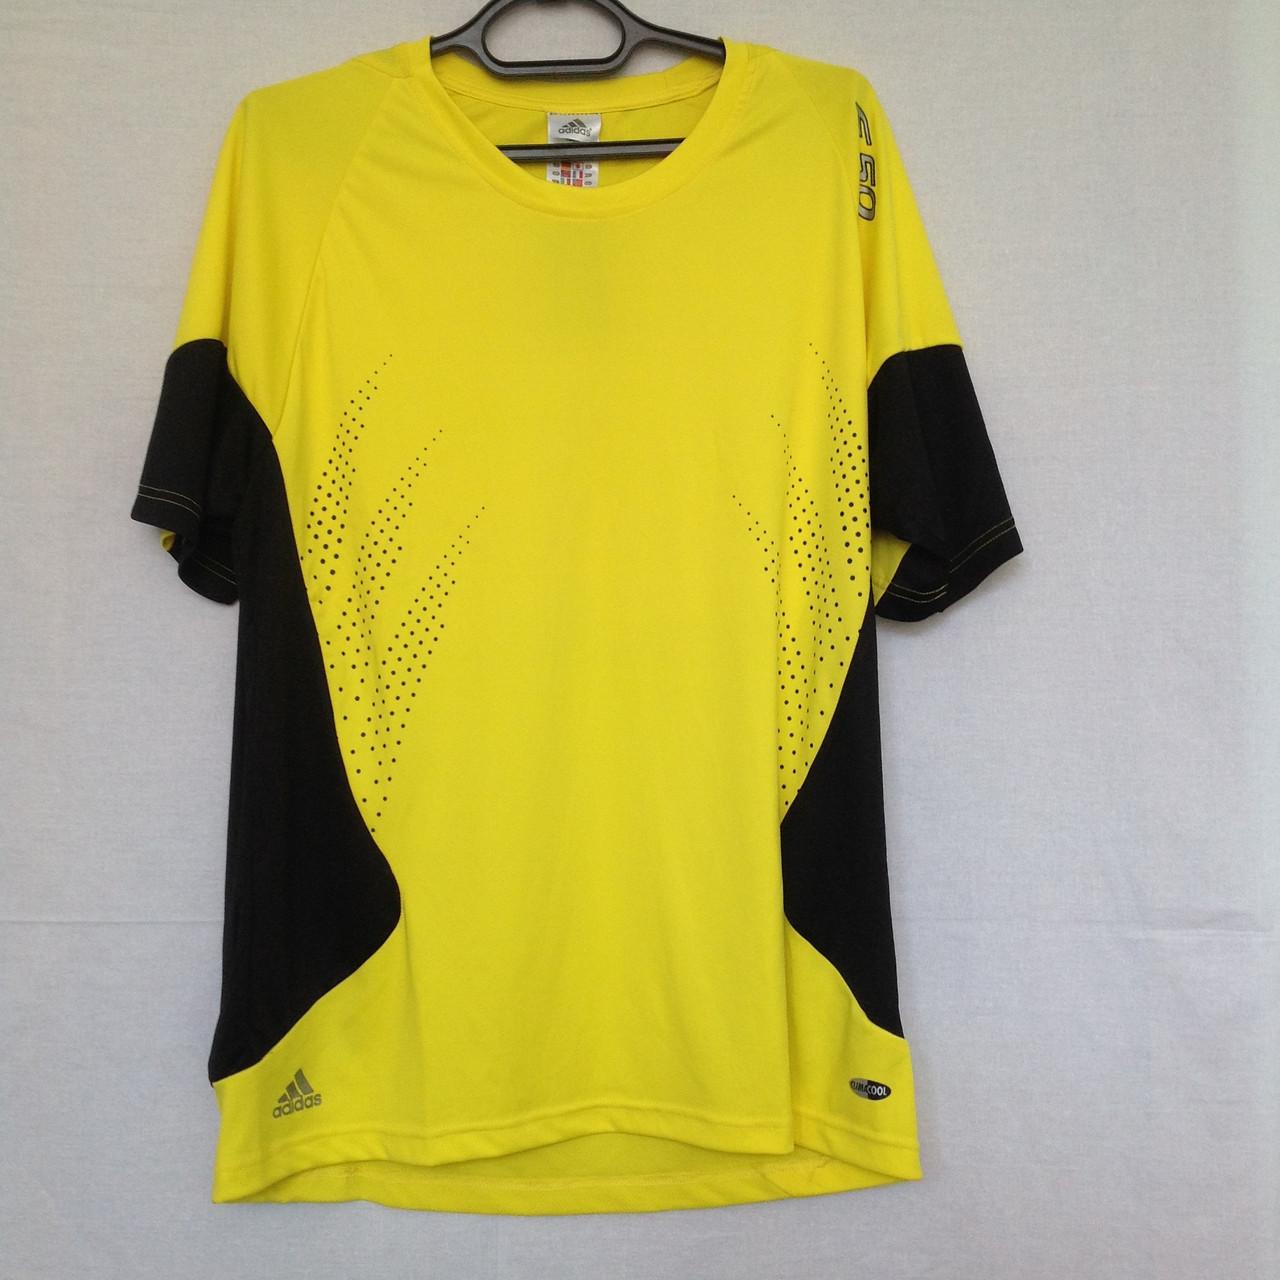 129118695ff Мужская спортивная футболка Adidas ClimaCool.  продажа